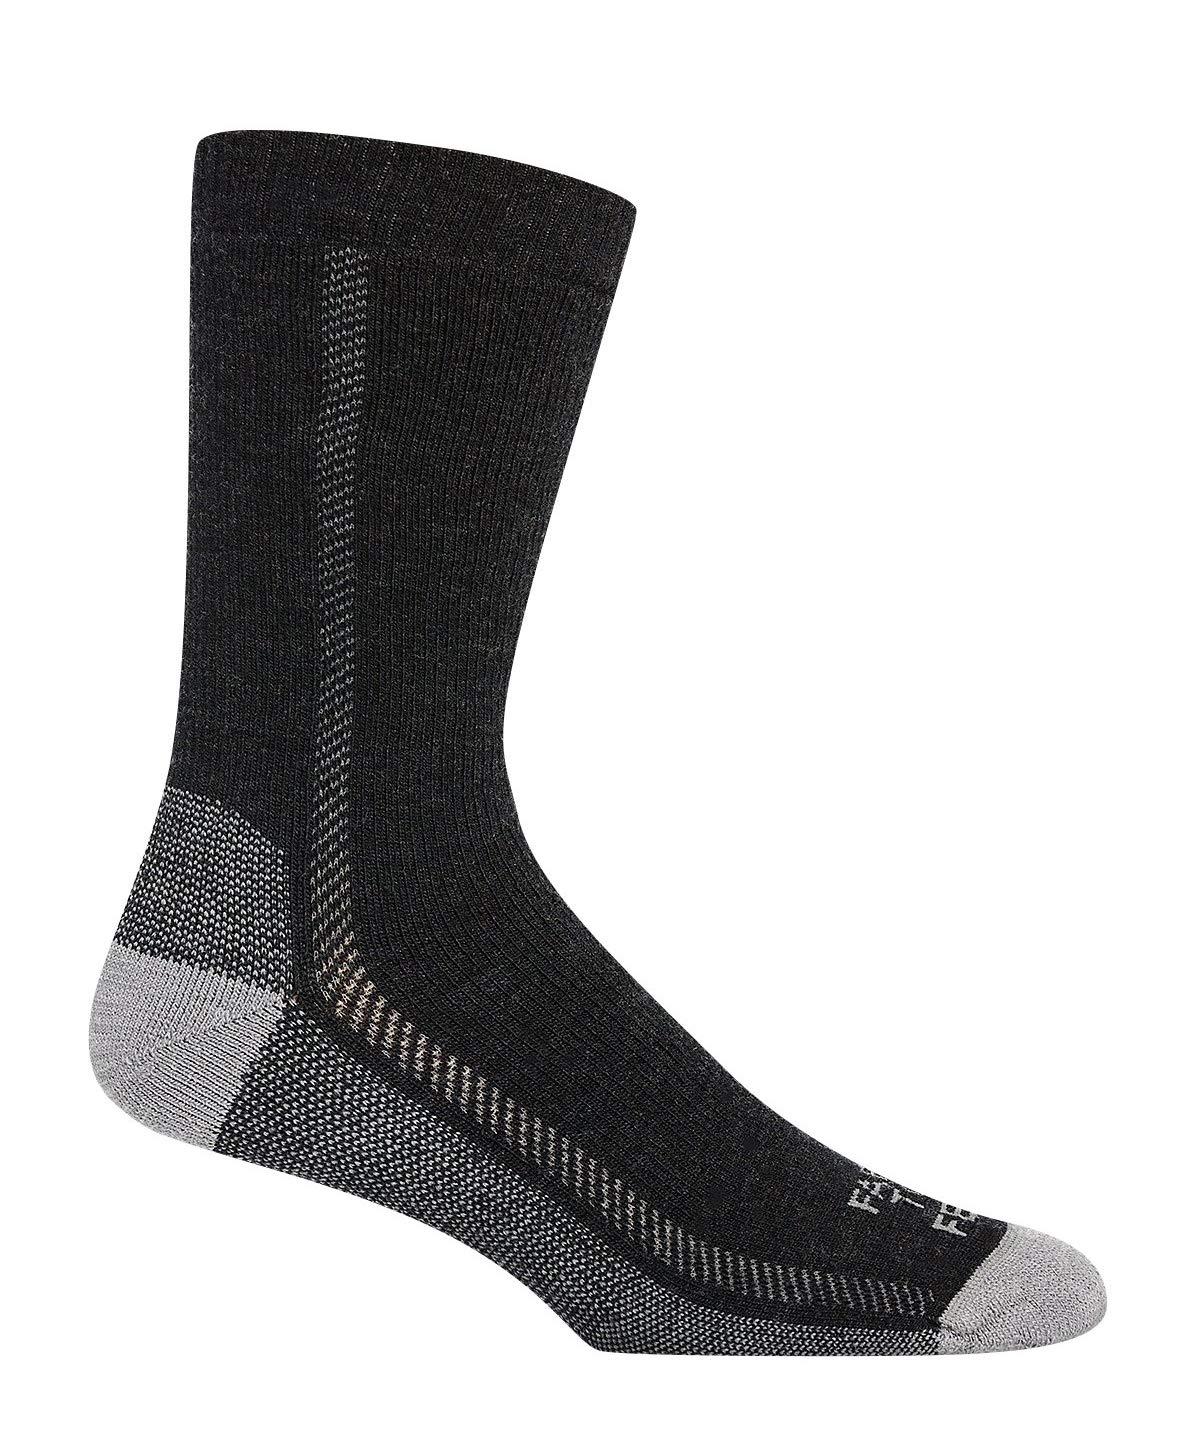 Farm to Feet Madison Lightweight Hiking Crew Socks, Charcoal/Platinum, X-Large by Farm to Feet